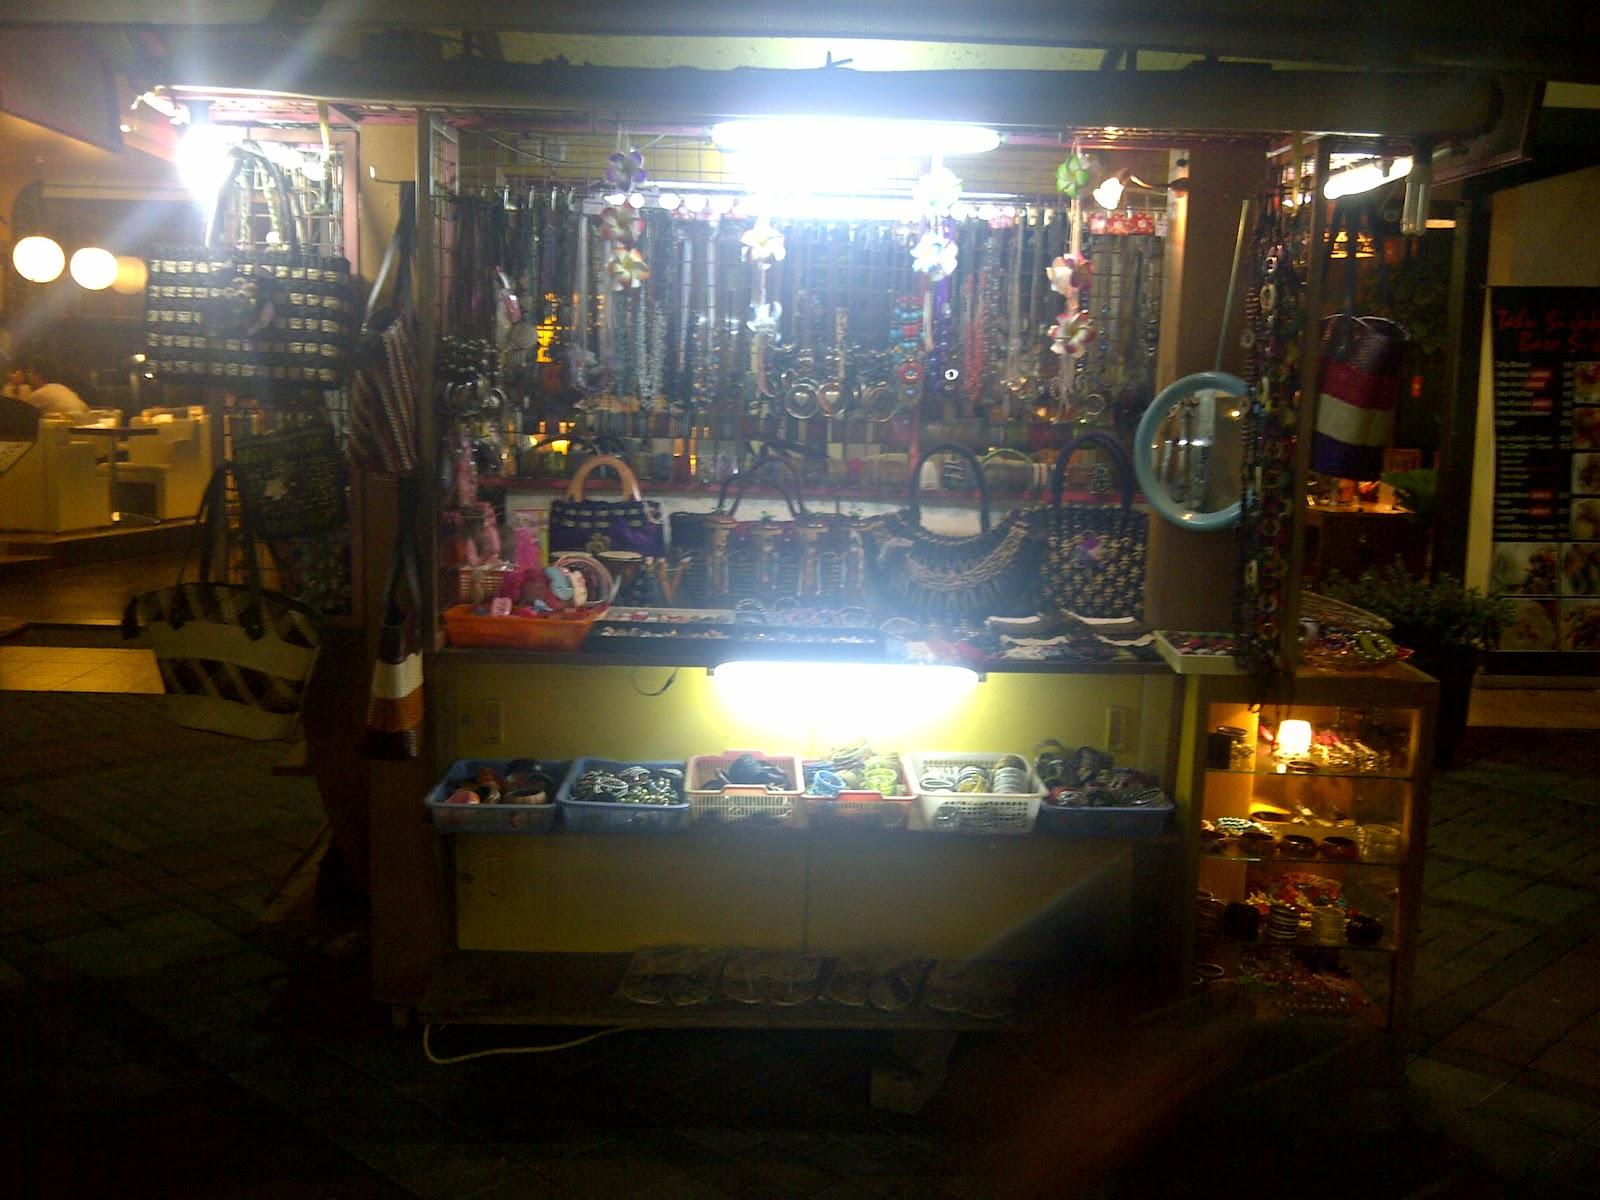 IMG 20120517 00096 Bandung, a passionate night athmosphere